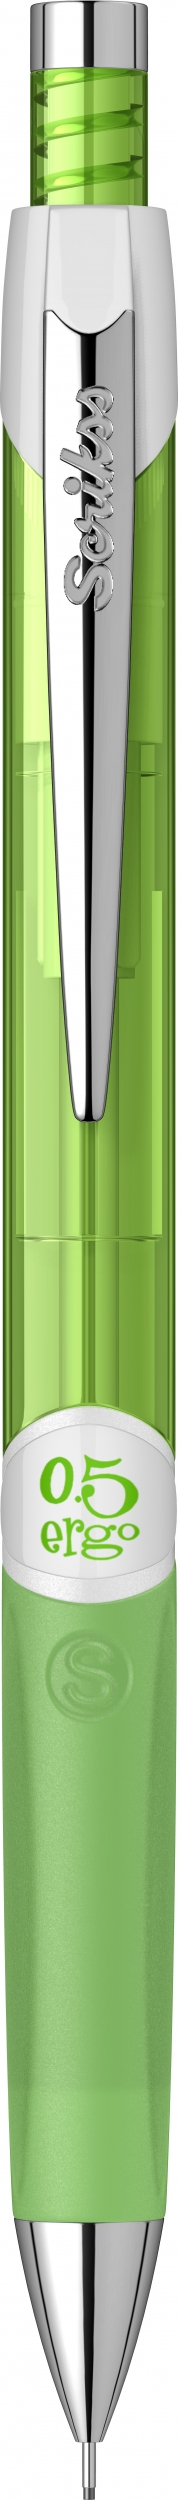 Механичен молив Ergo Scrikss 0,5мм., модел 72131, , Неон Зелен